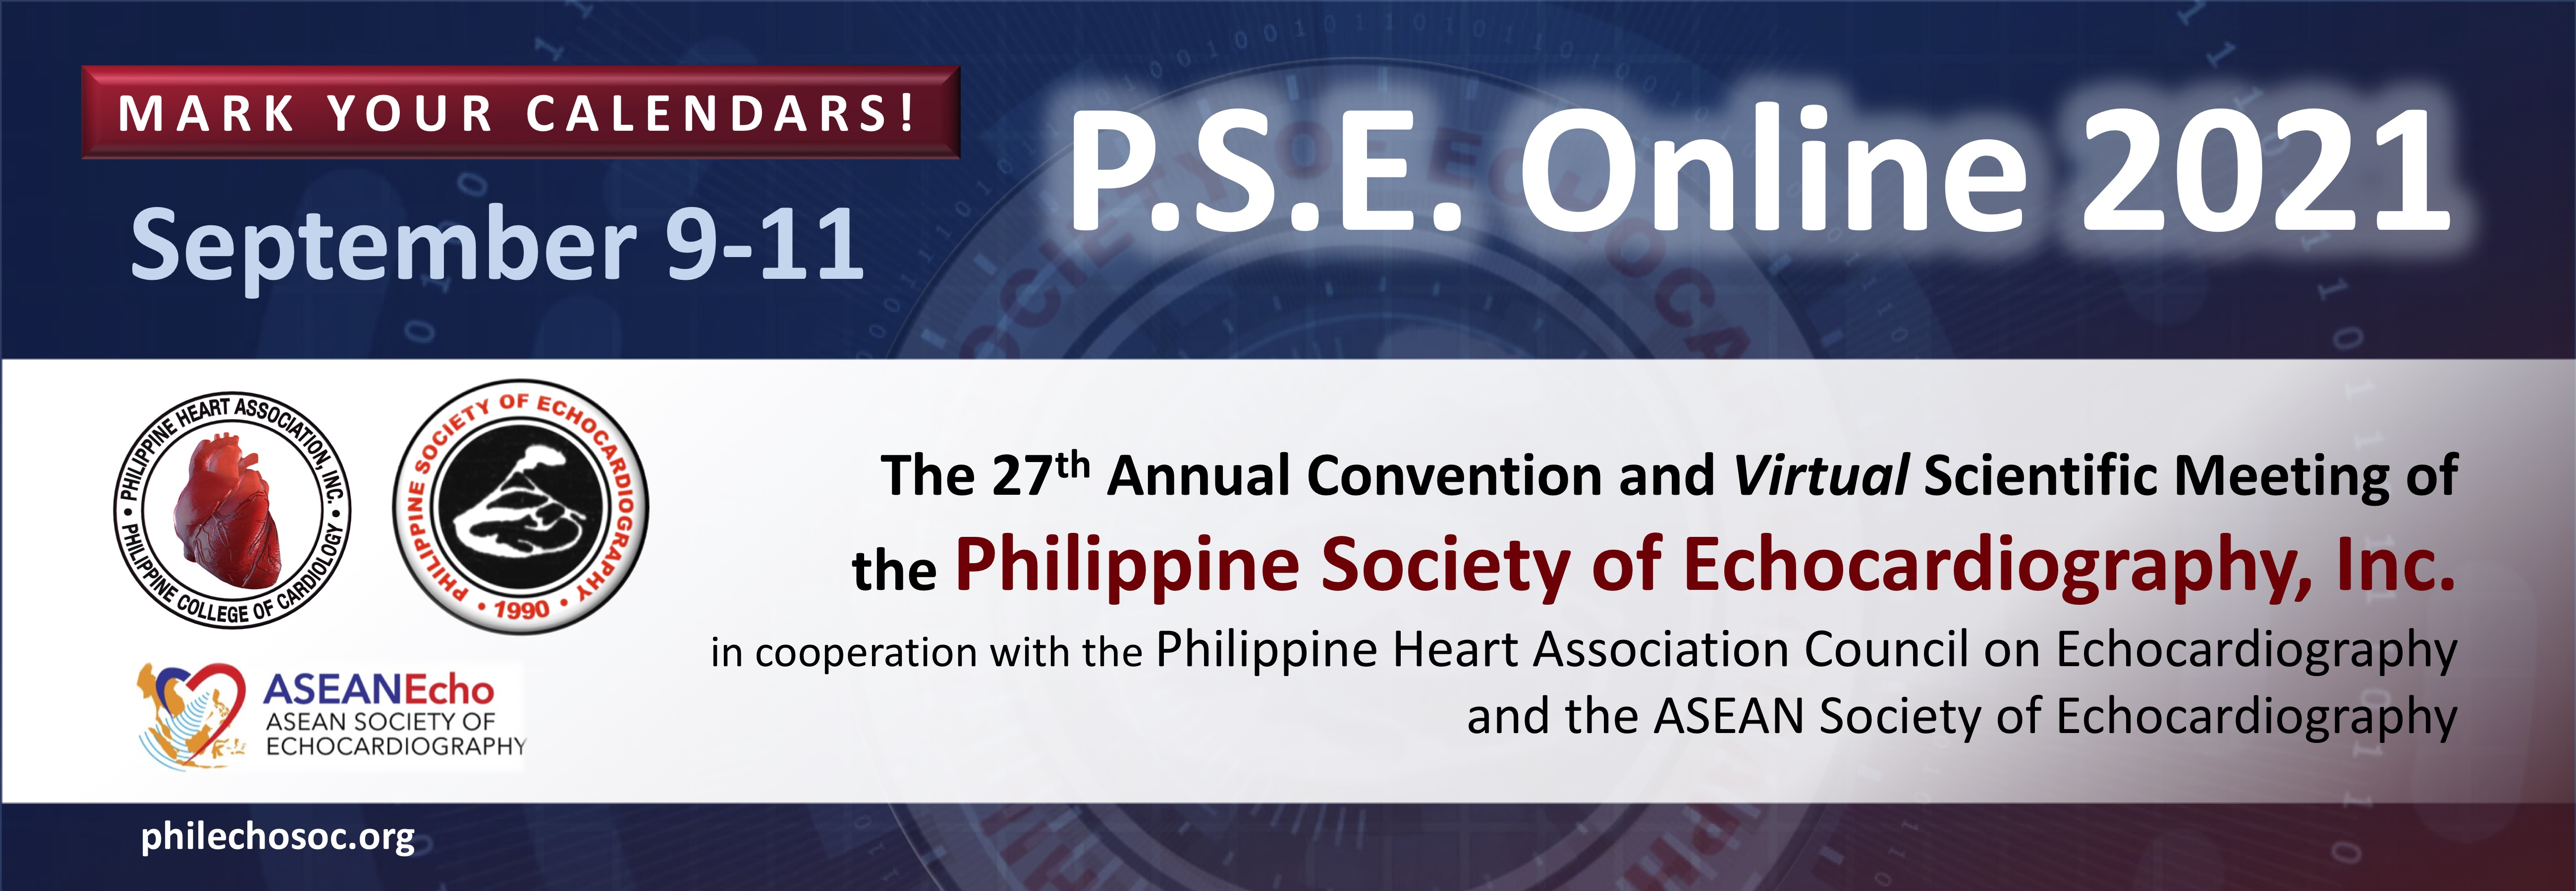 PSE_Online_2021_teaser